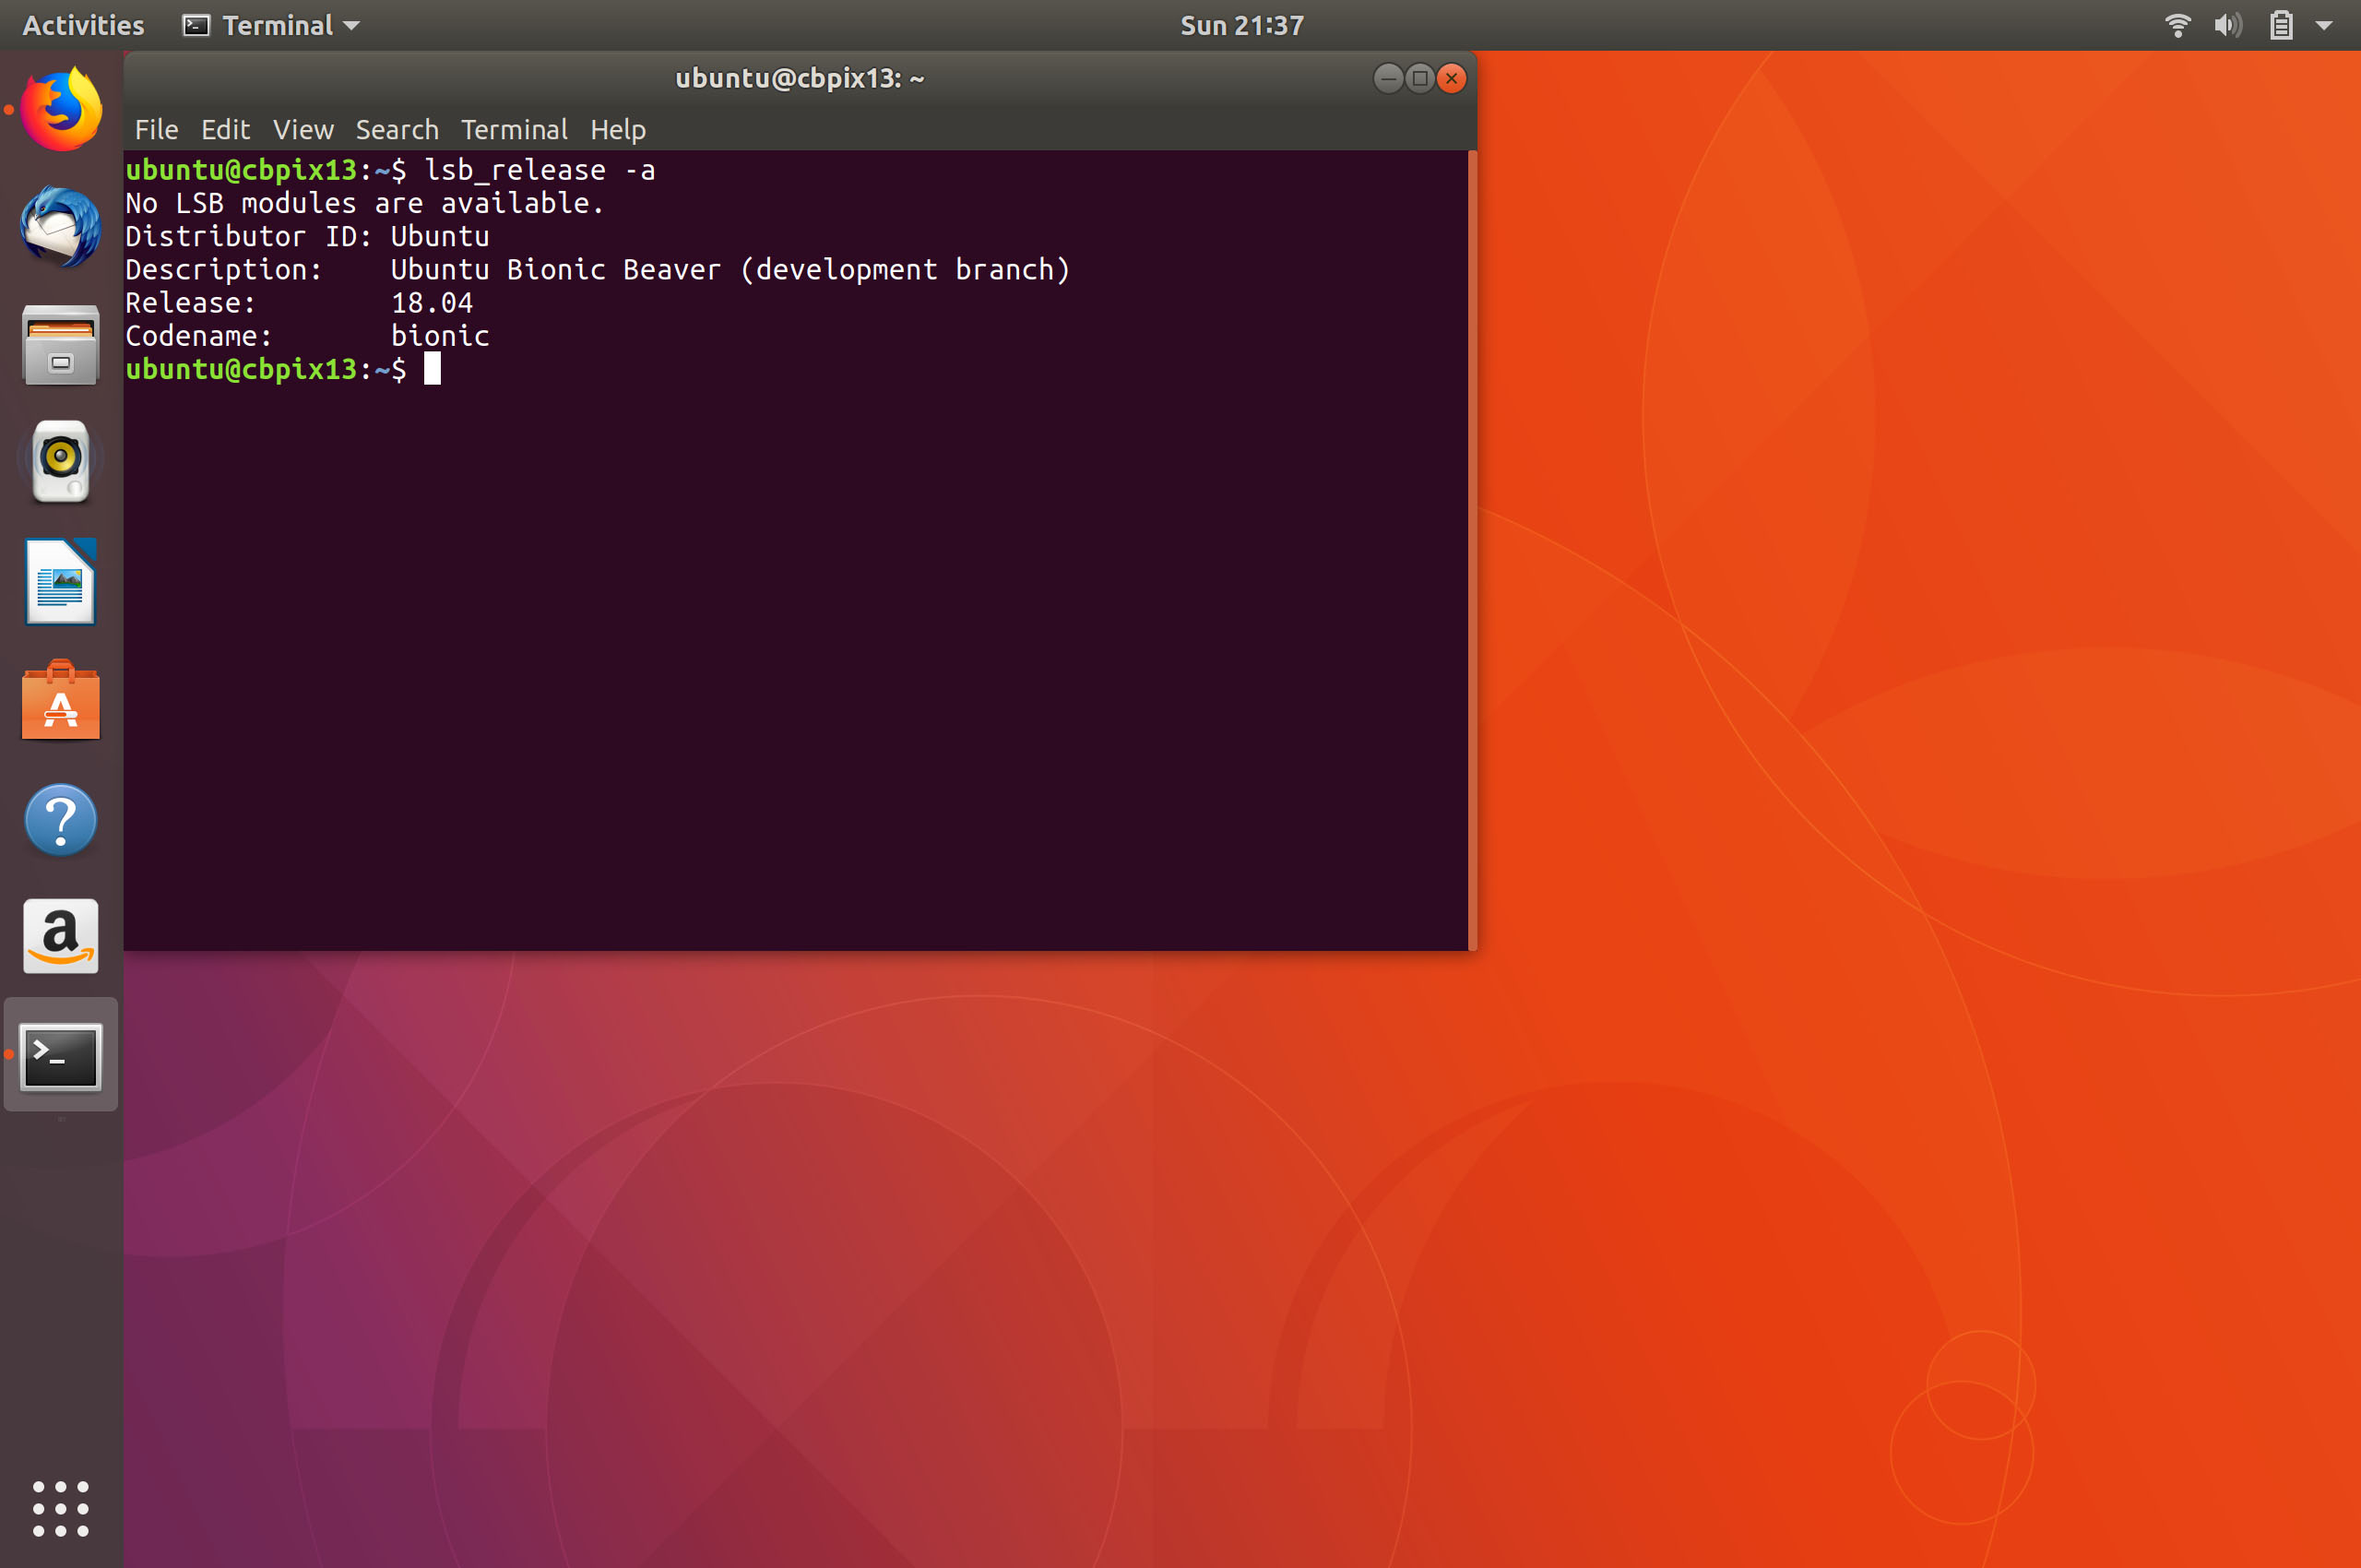 Google Chromebook Pixel Running Ubuntu 18 04 Bionic Beaver